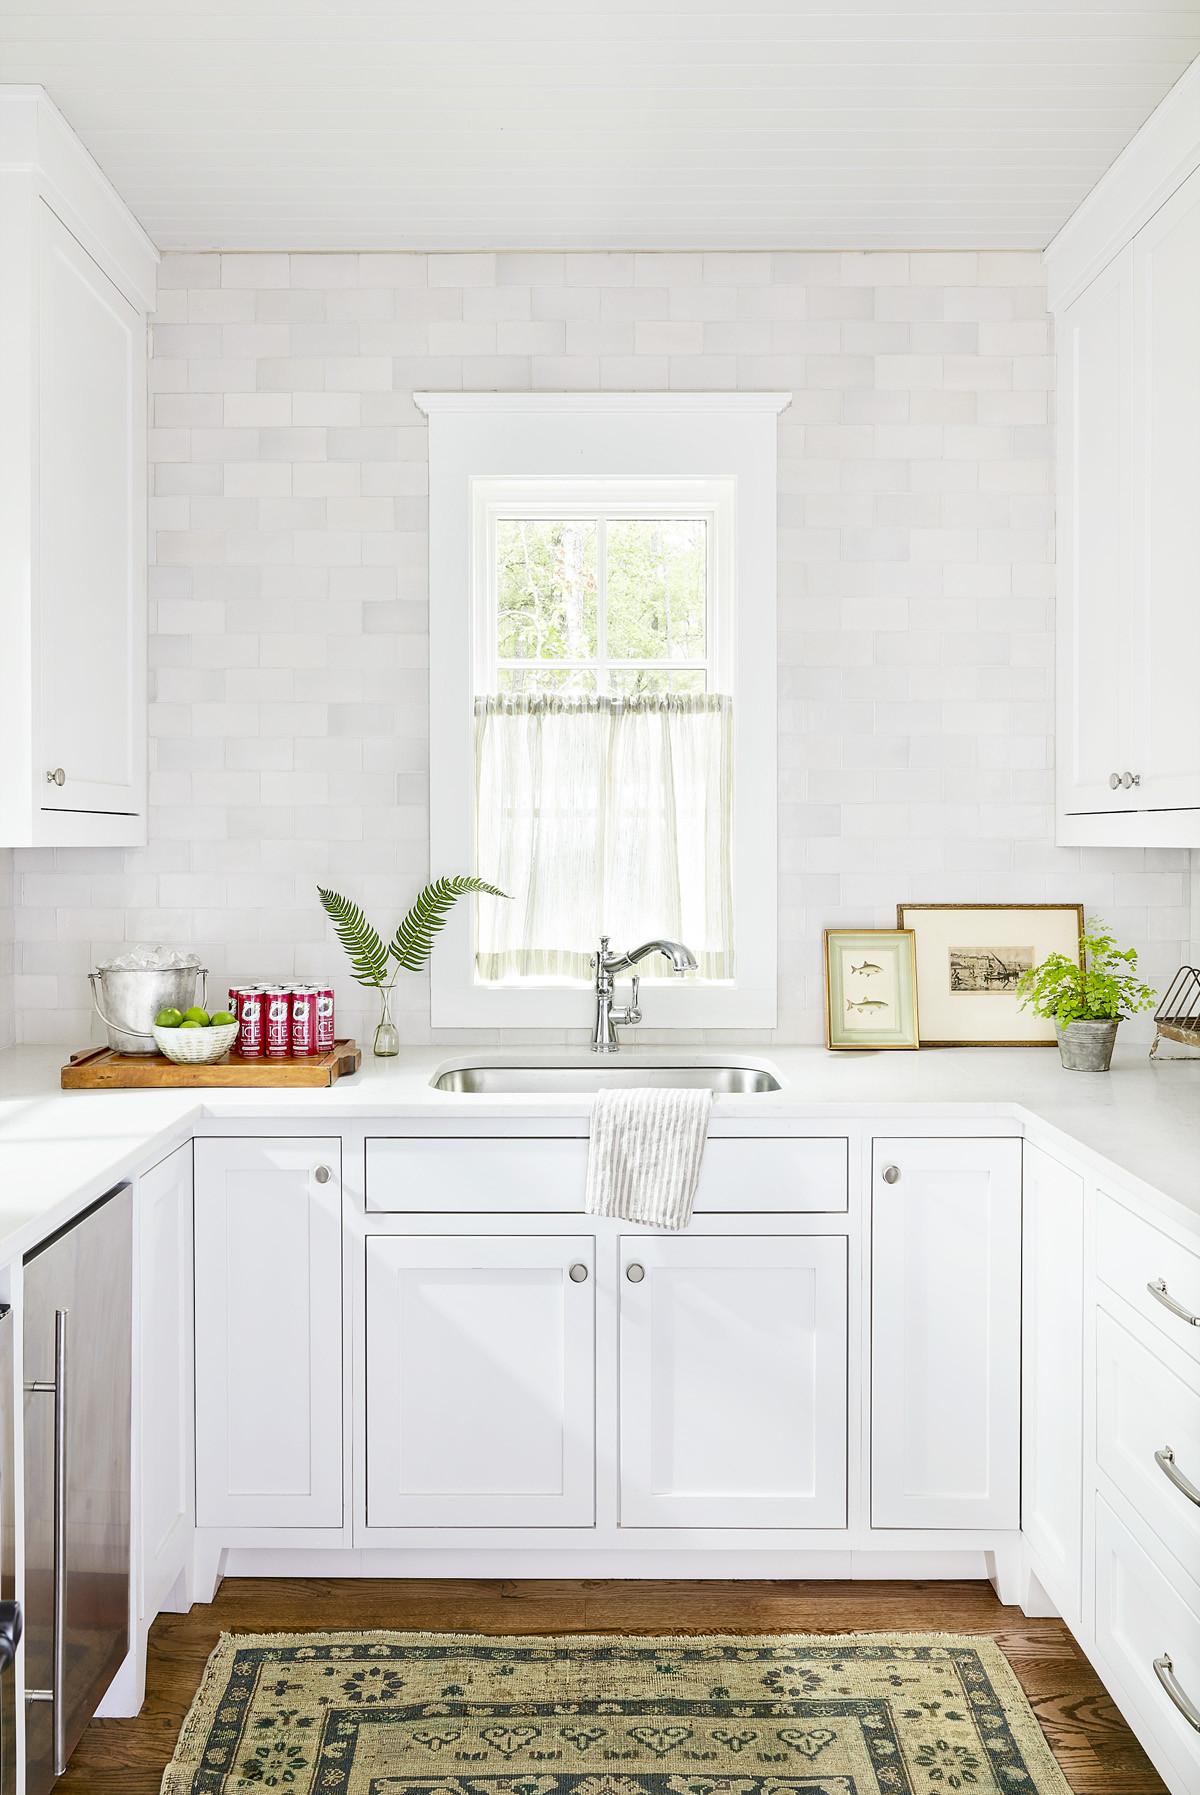 Best ideas about White Kitchen Ideas . Save or Pin 24 Best White Kitchens of White Kitchen Design Now.